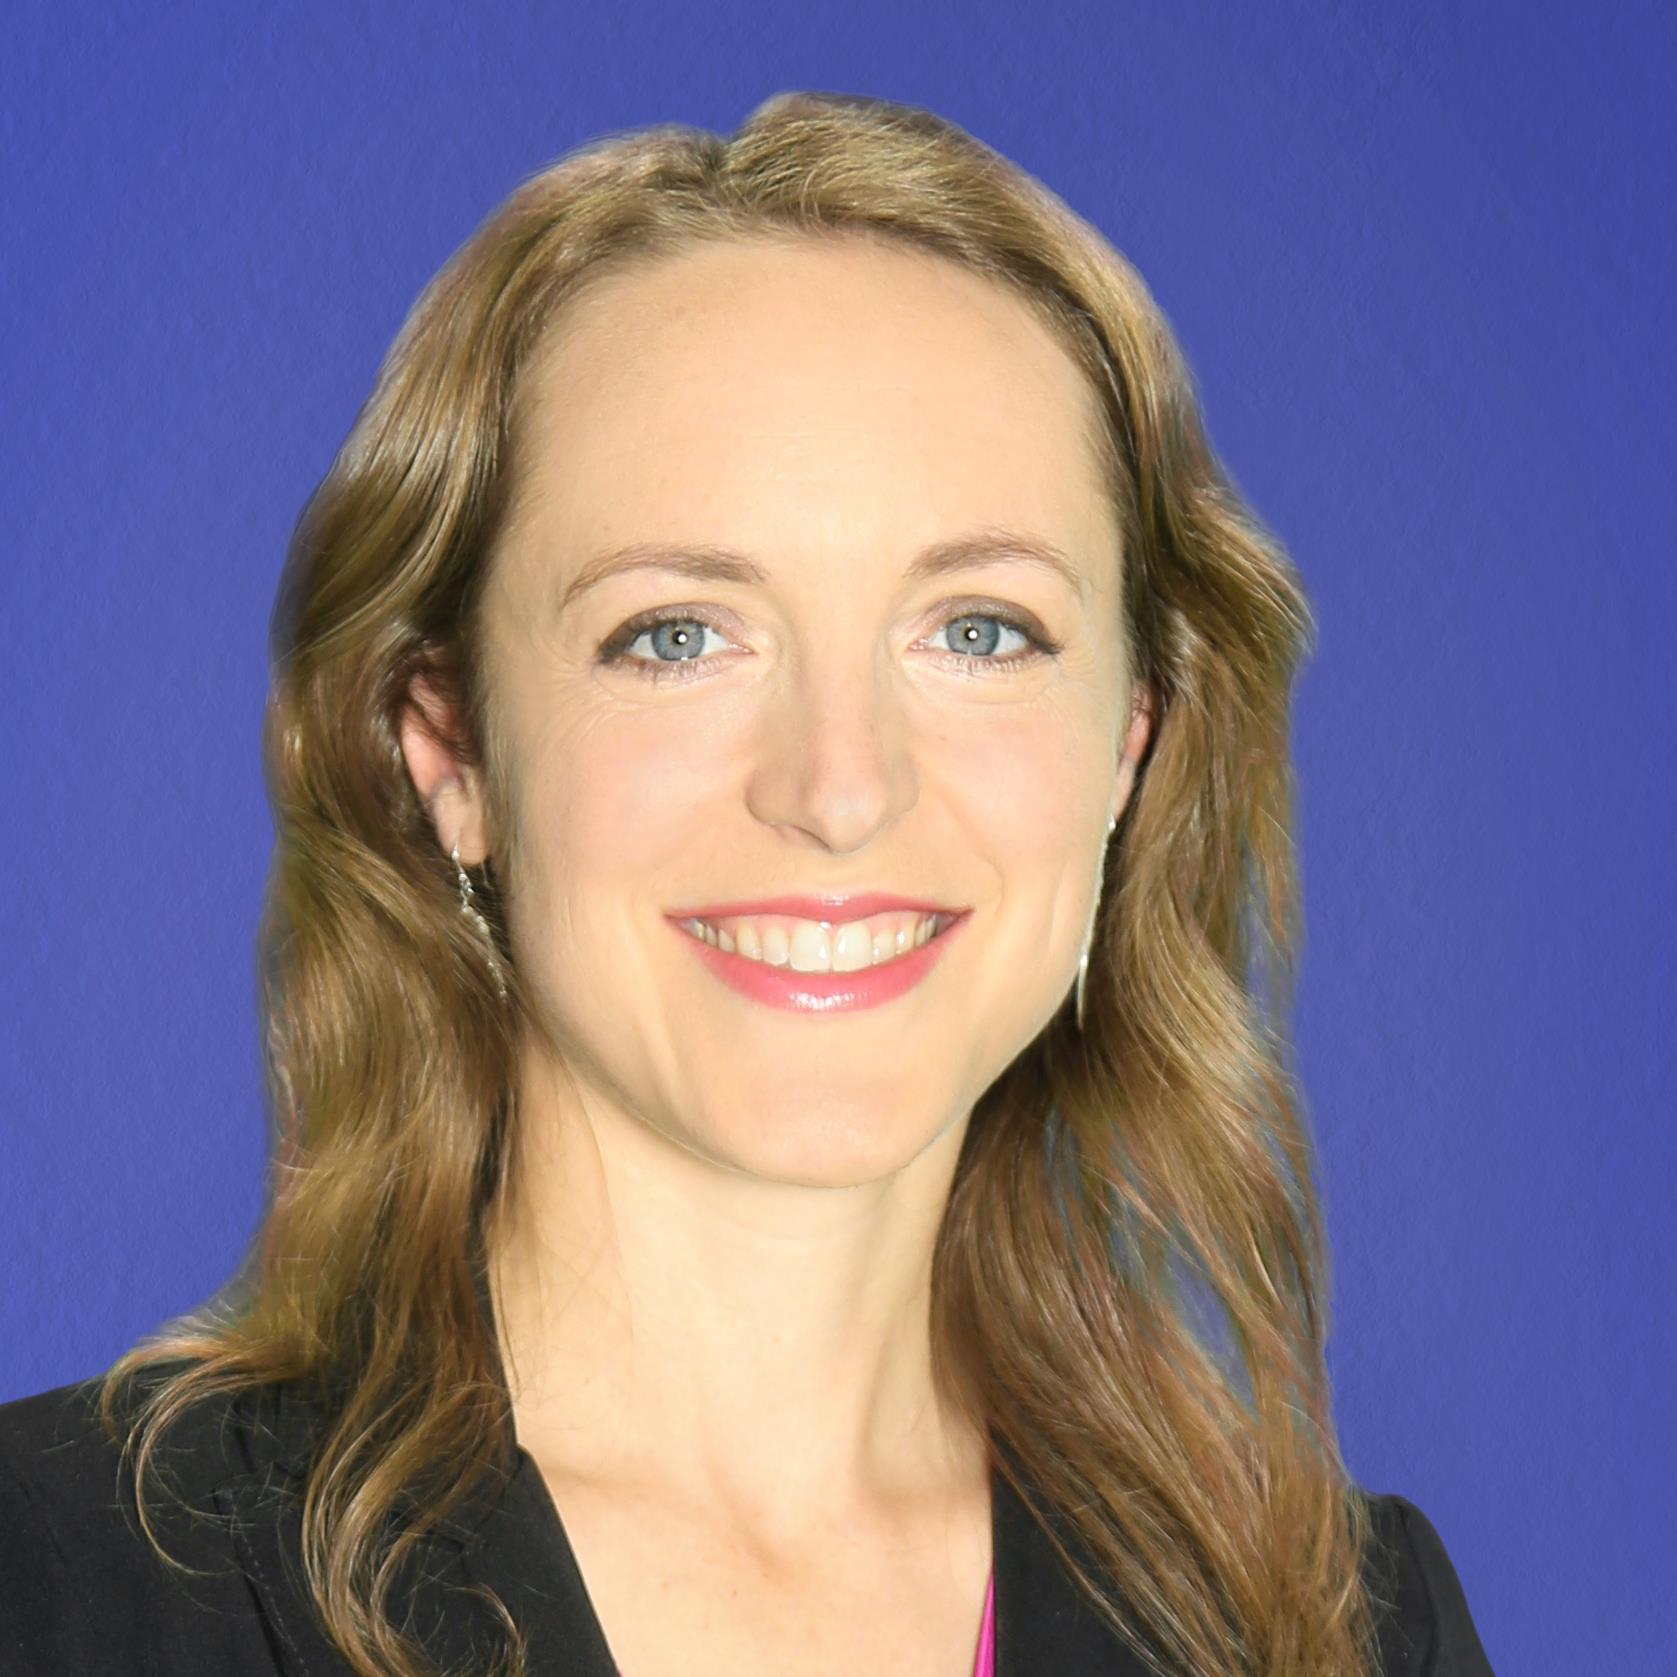 Sarah Le